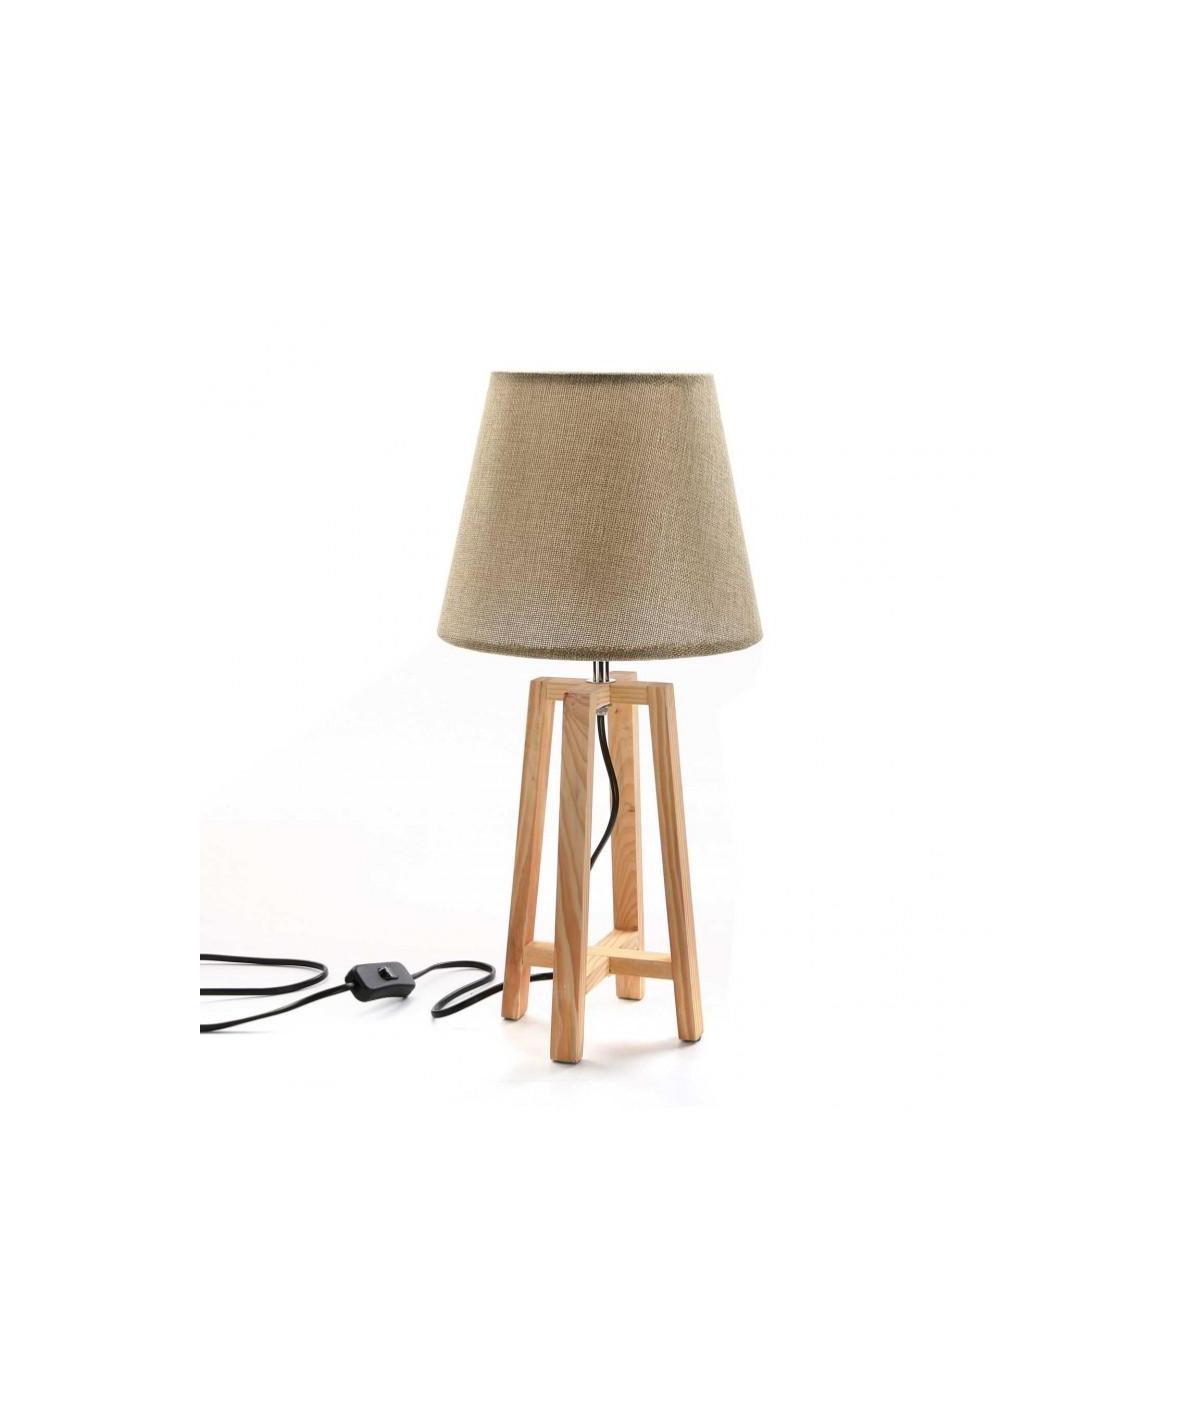 Lampe sur trépied en bois H48cm - Scandi   Yesdeko